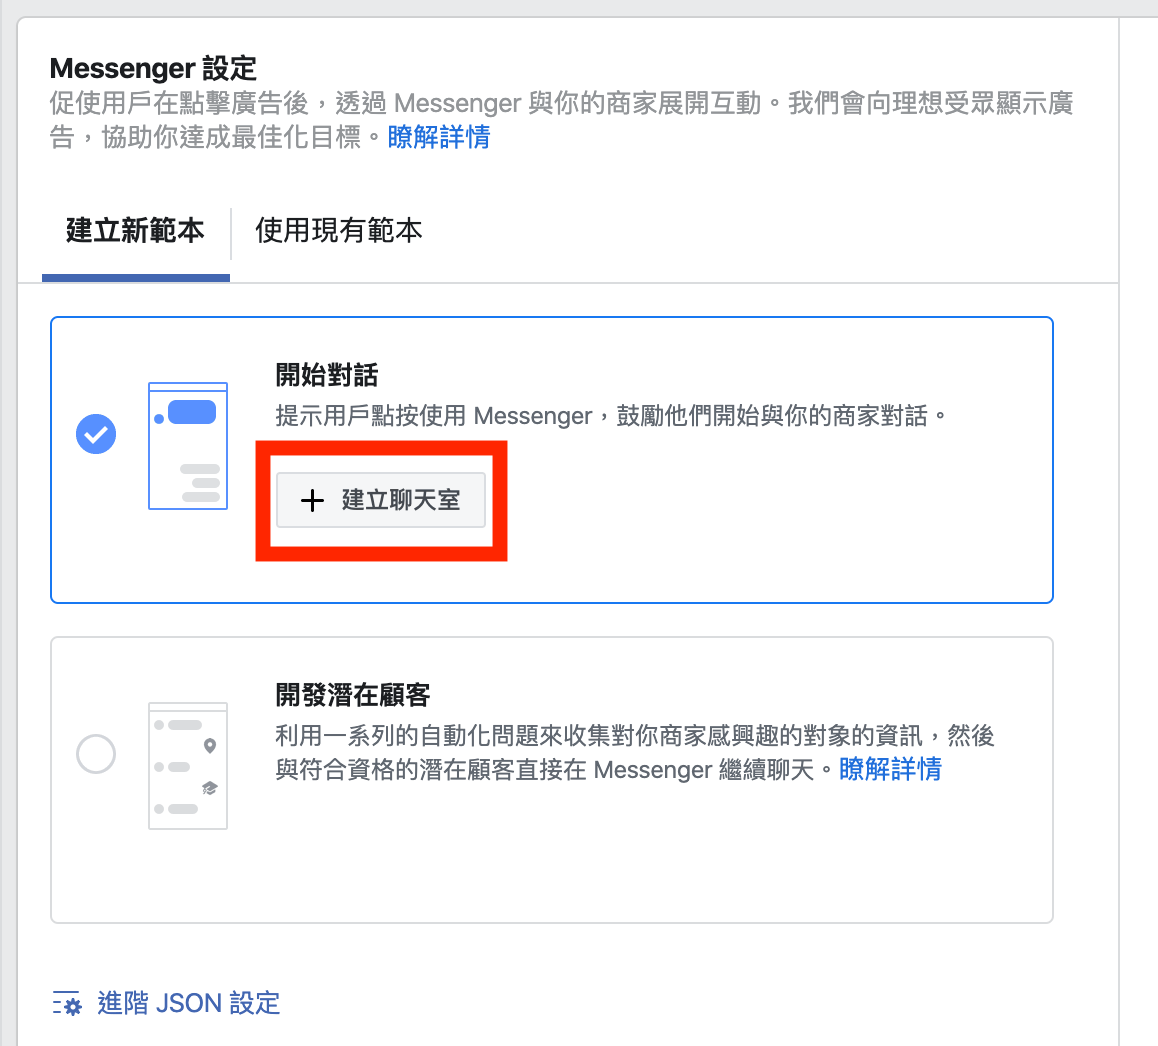 Messenger 訊息廣告設定,建立聊天室